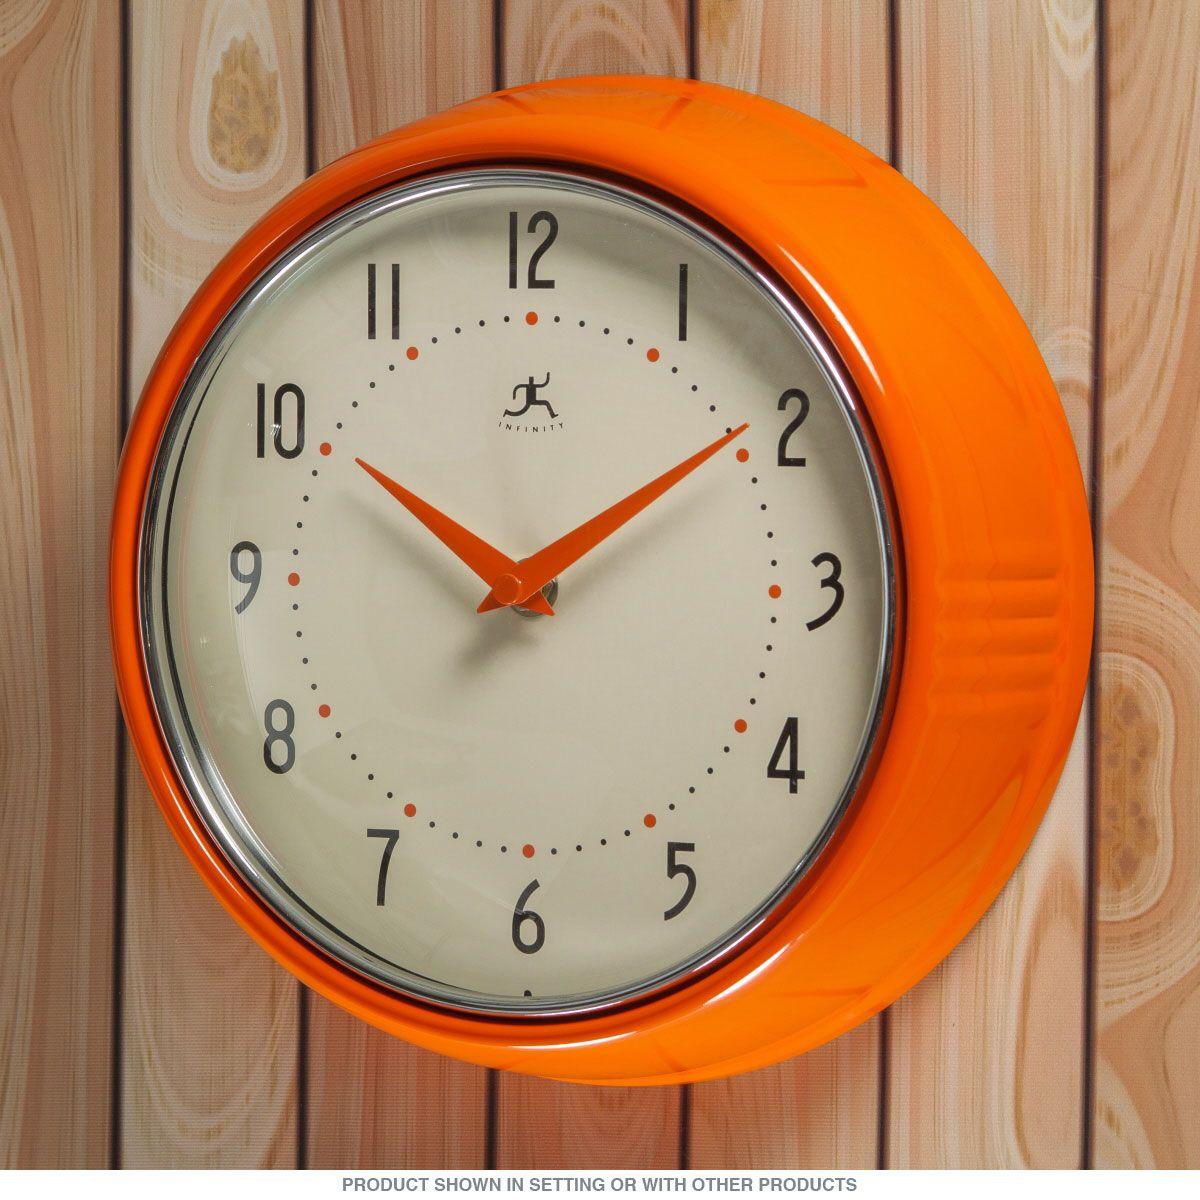 Orange FiftiesStyle Kitchen Wall Clock Orange wall clocks